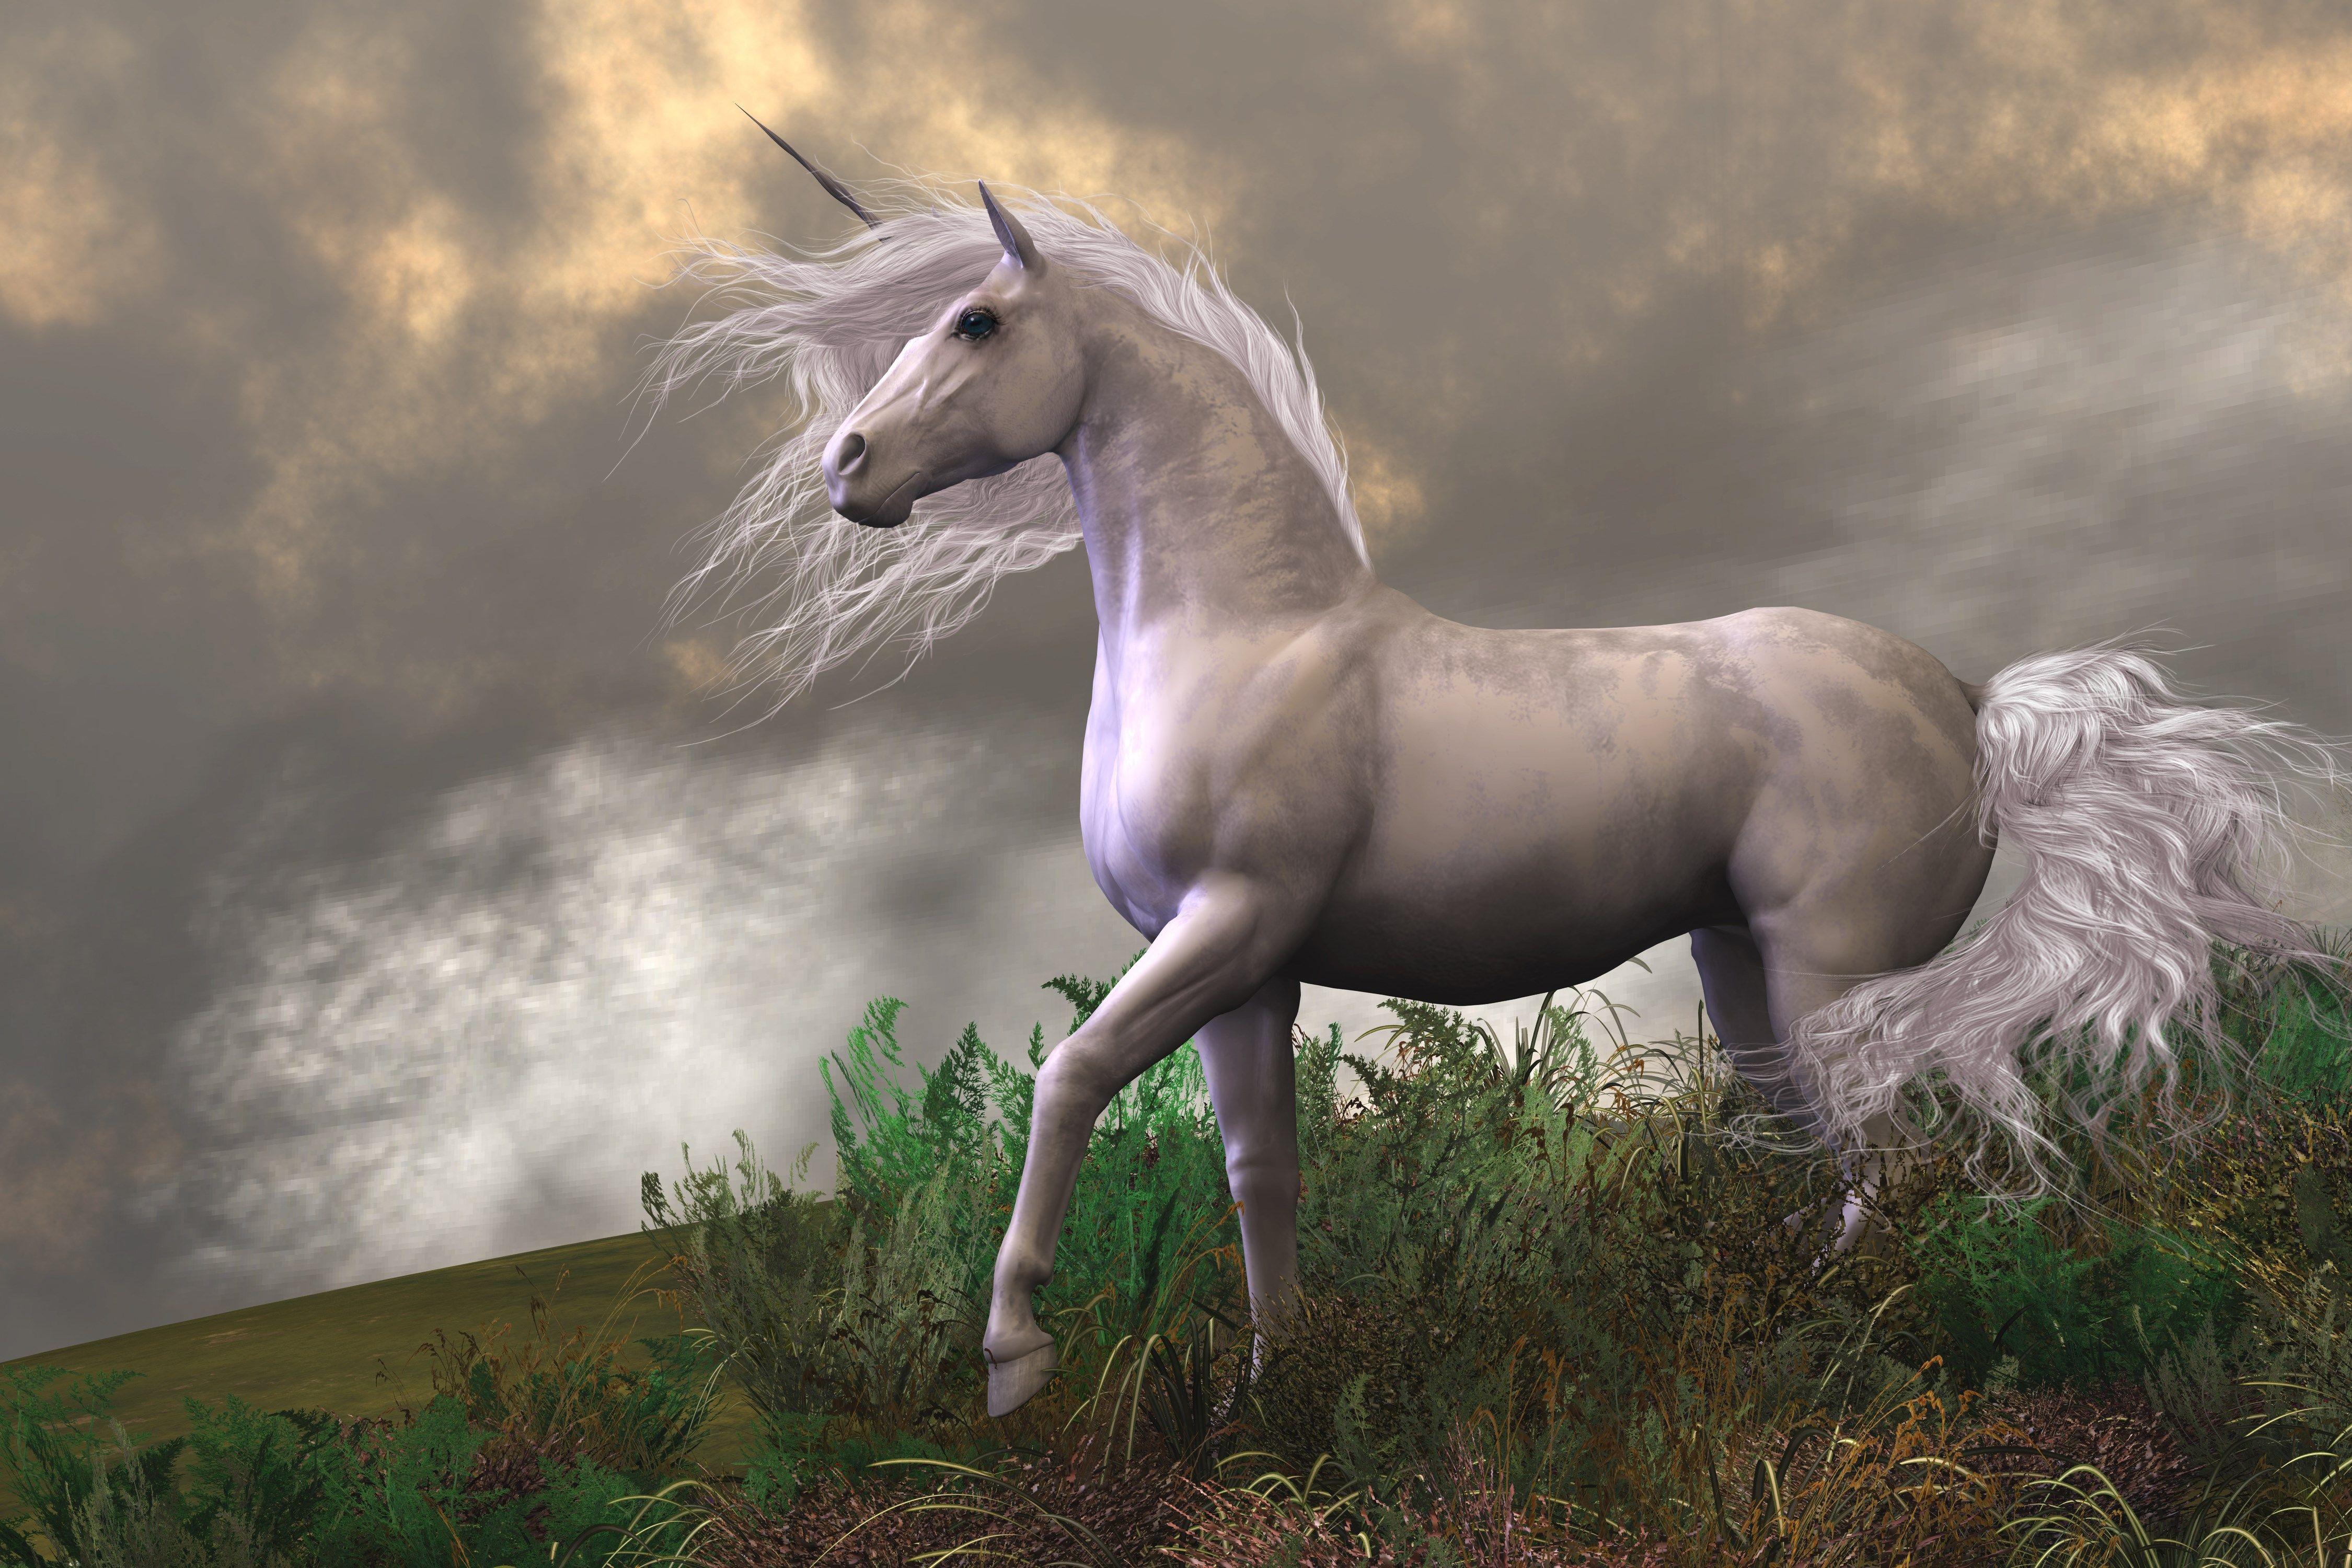 4k unicorn hd wallpaper (4500x3000)   Pinterest   Unicorns, Computer ...